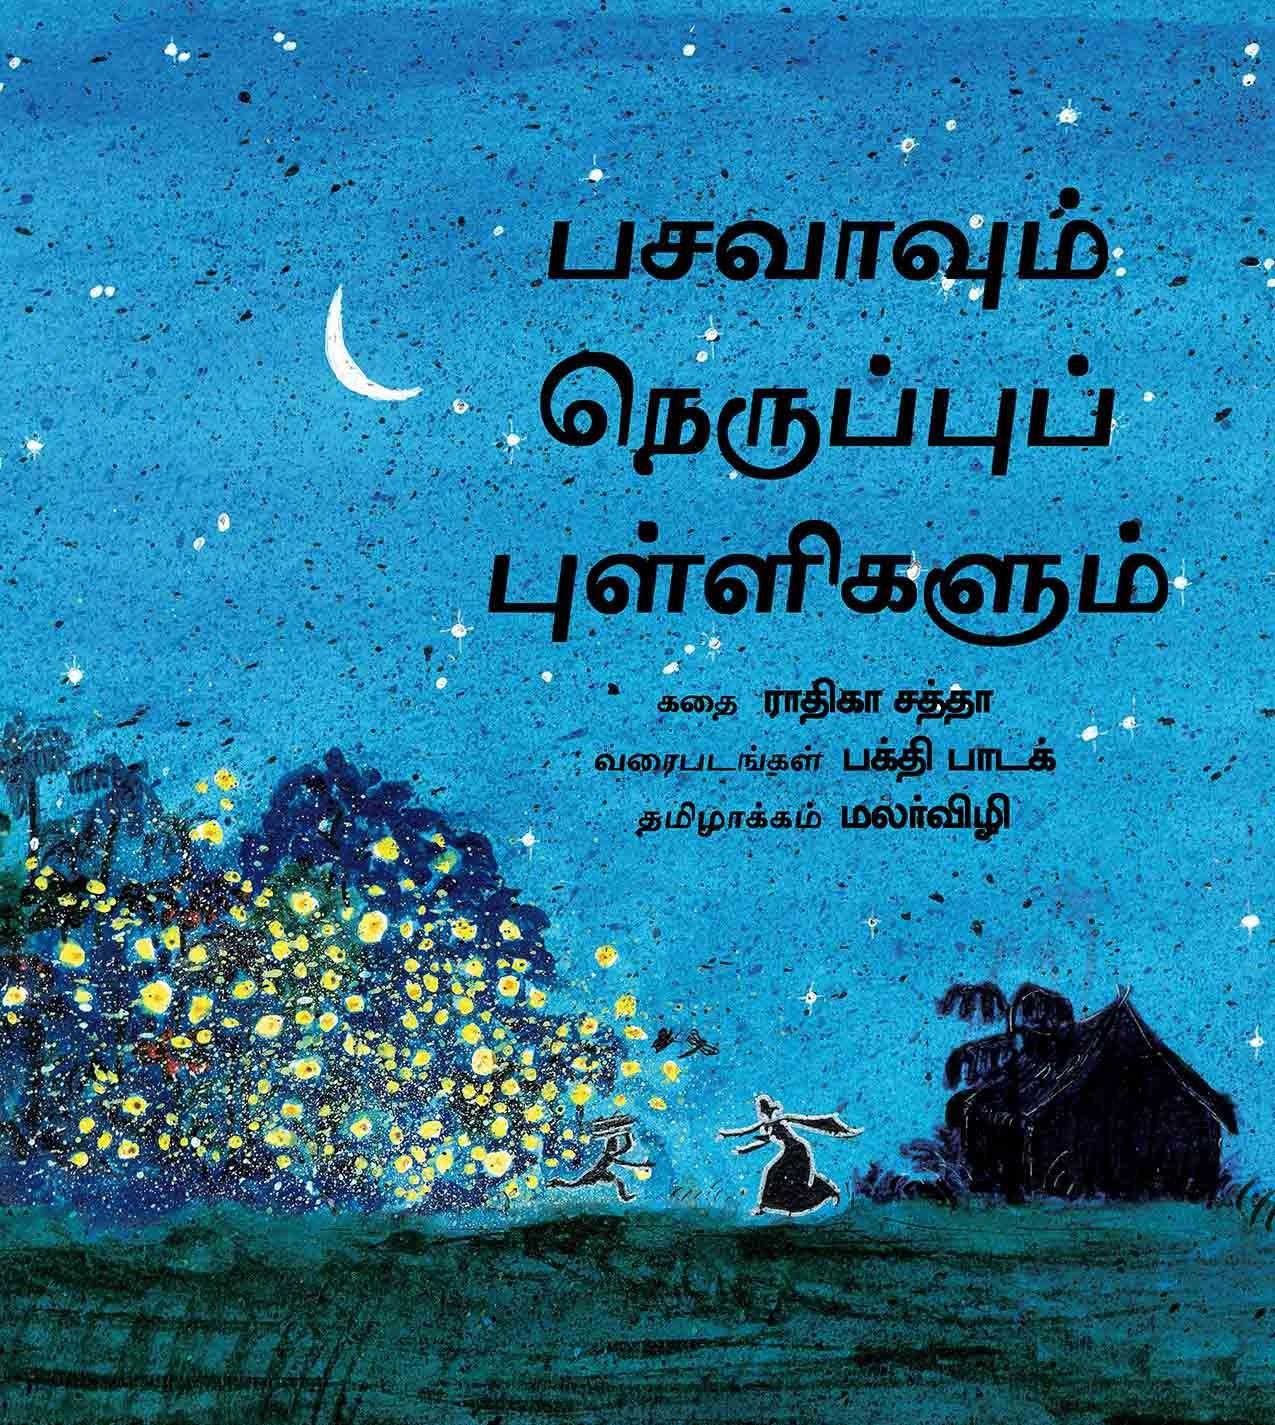 Basava And The Dots Of Fire/Basavavum Neruppupulligalum (Tamil)